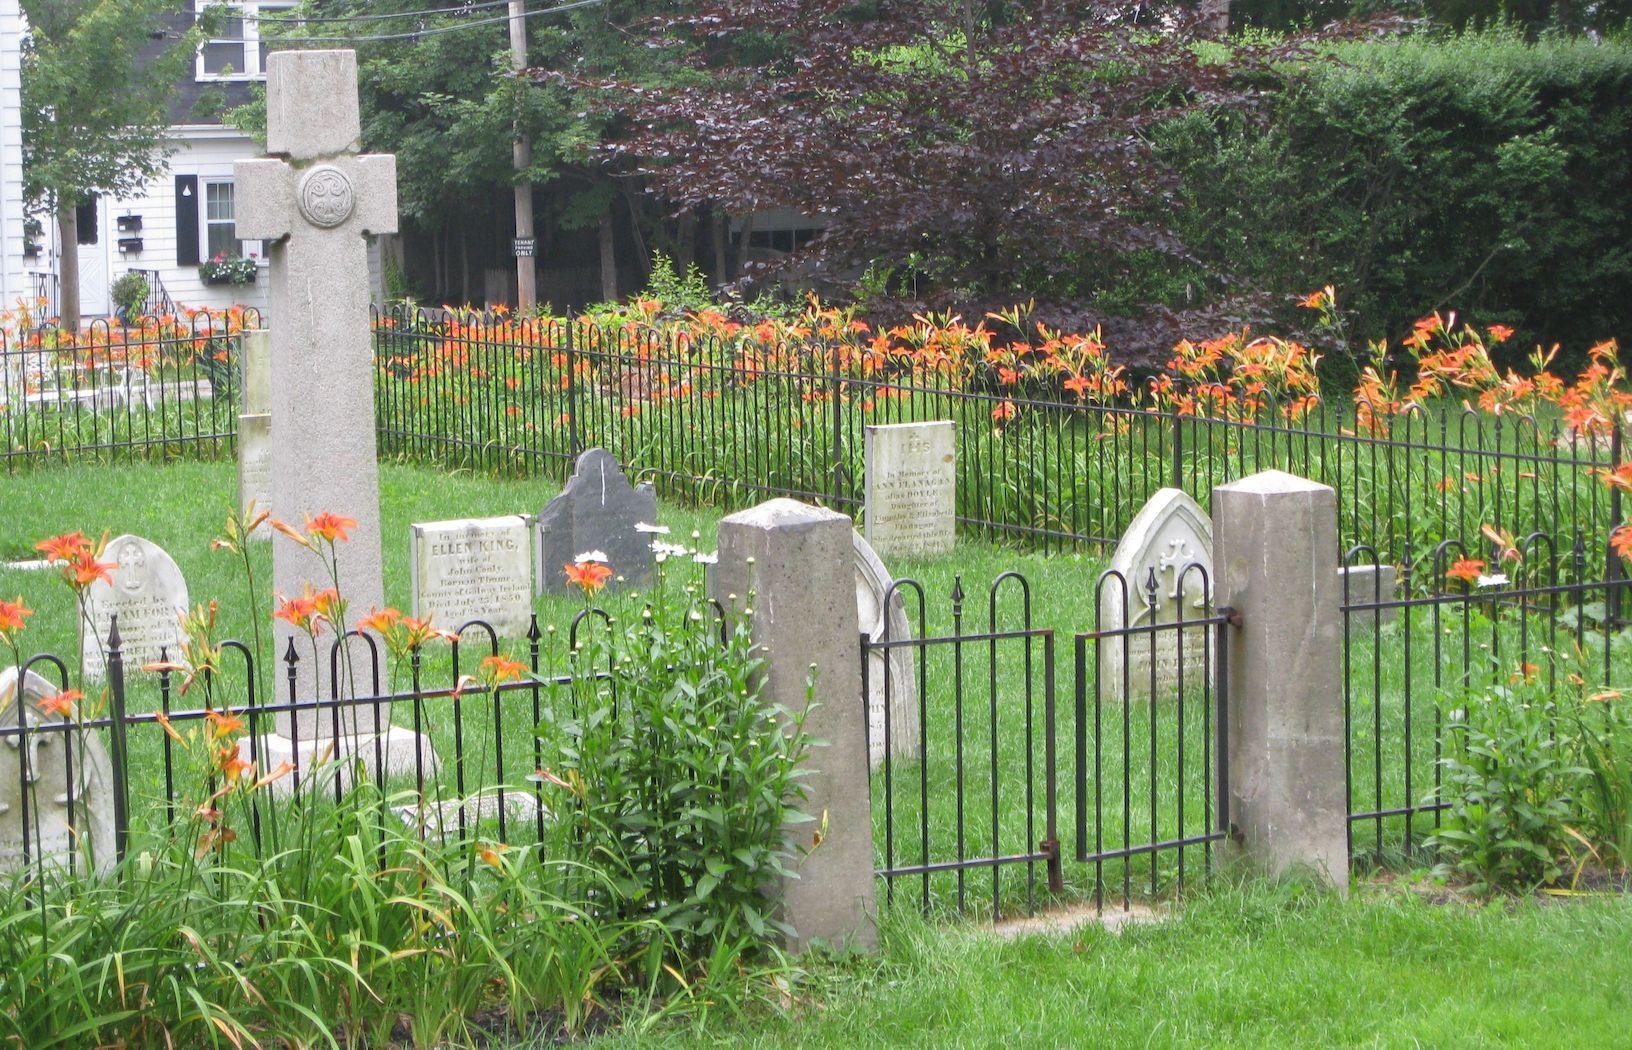 Barney Street (St. Joseph's) Cemetery